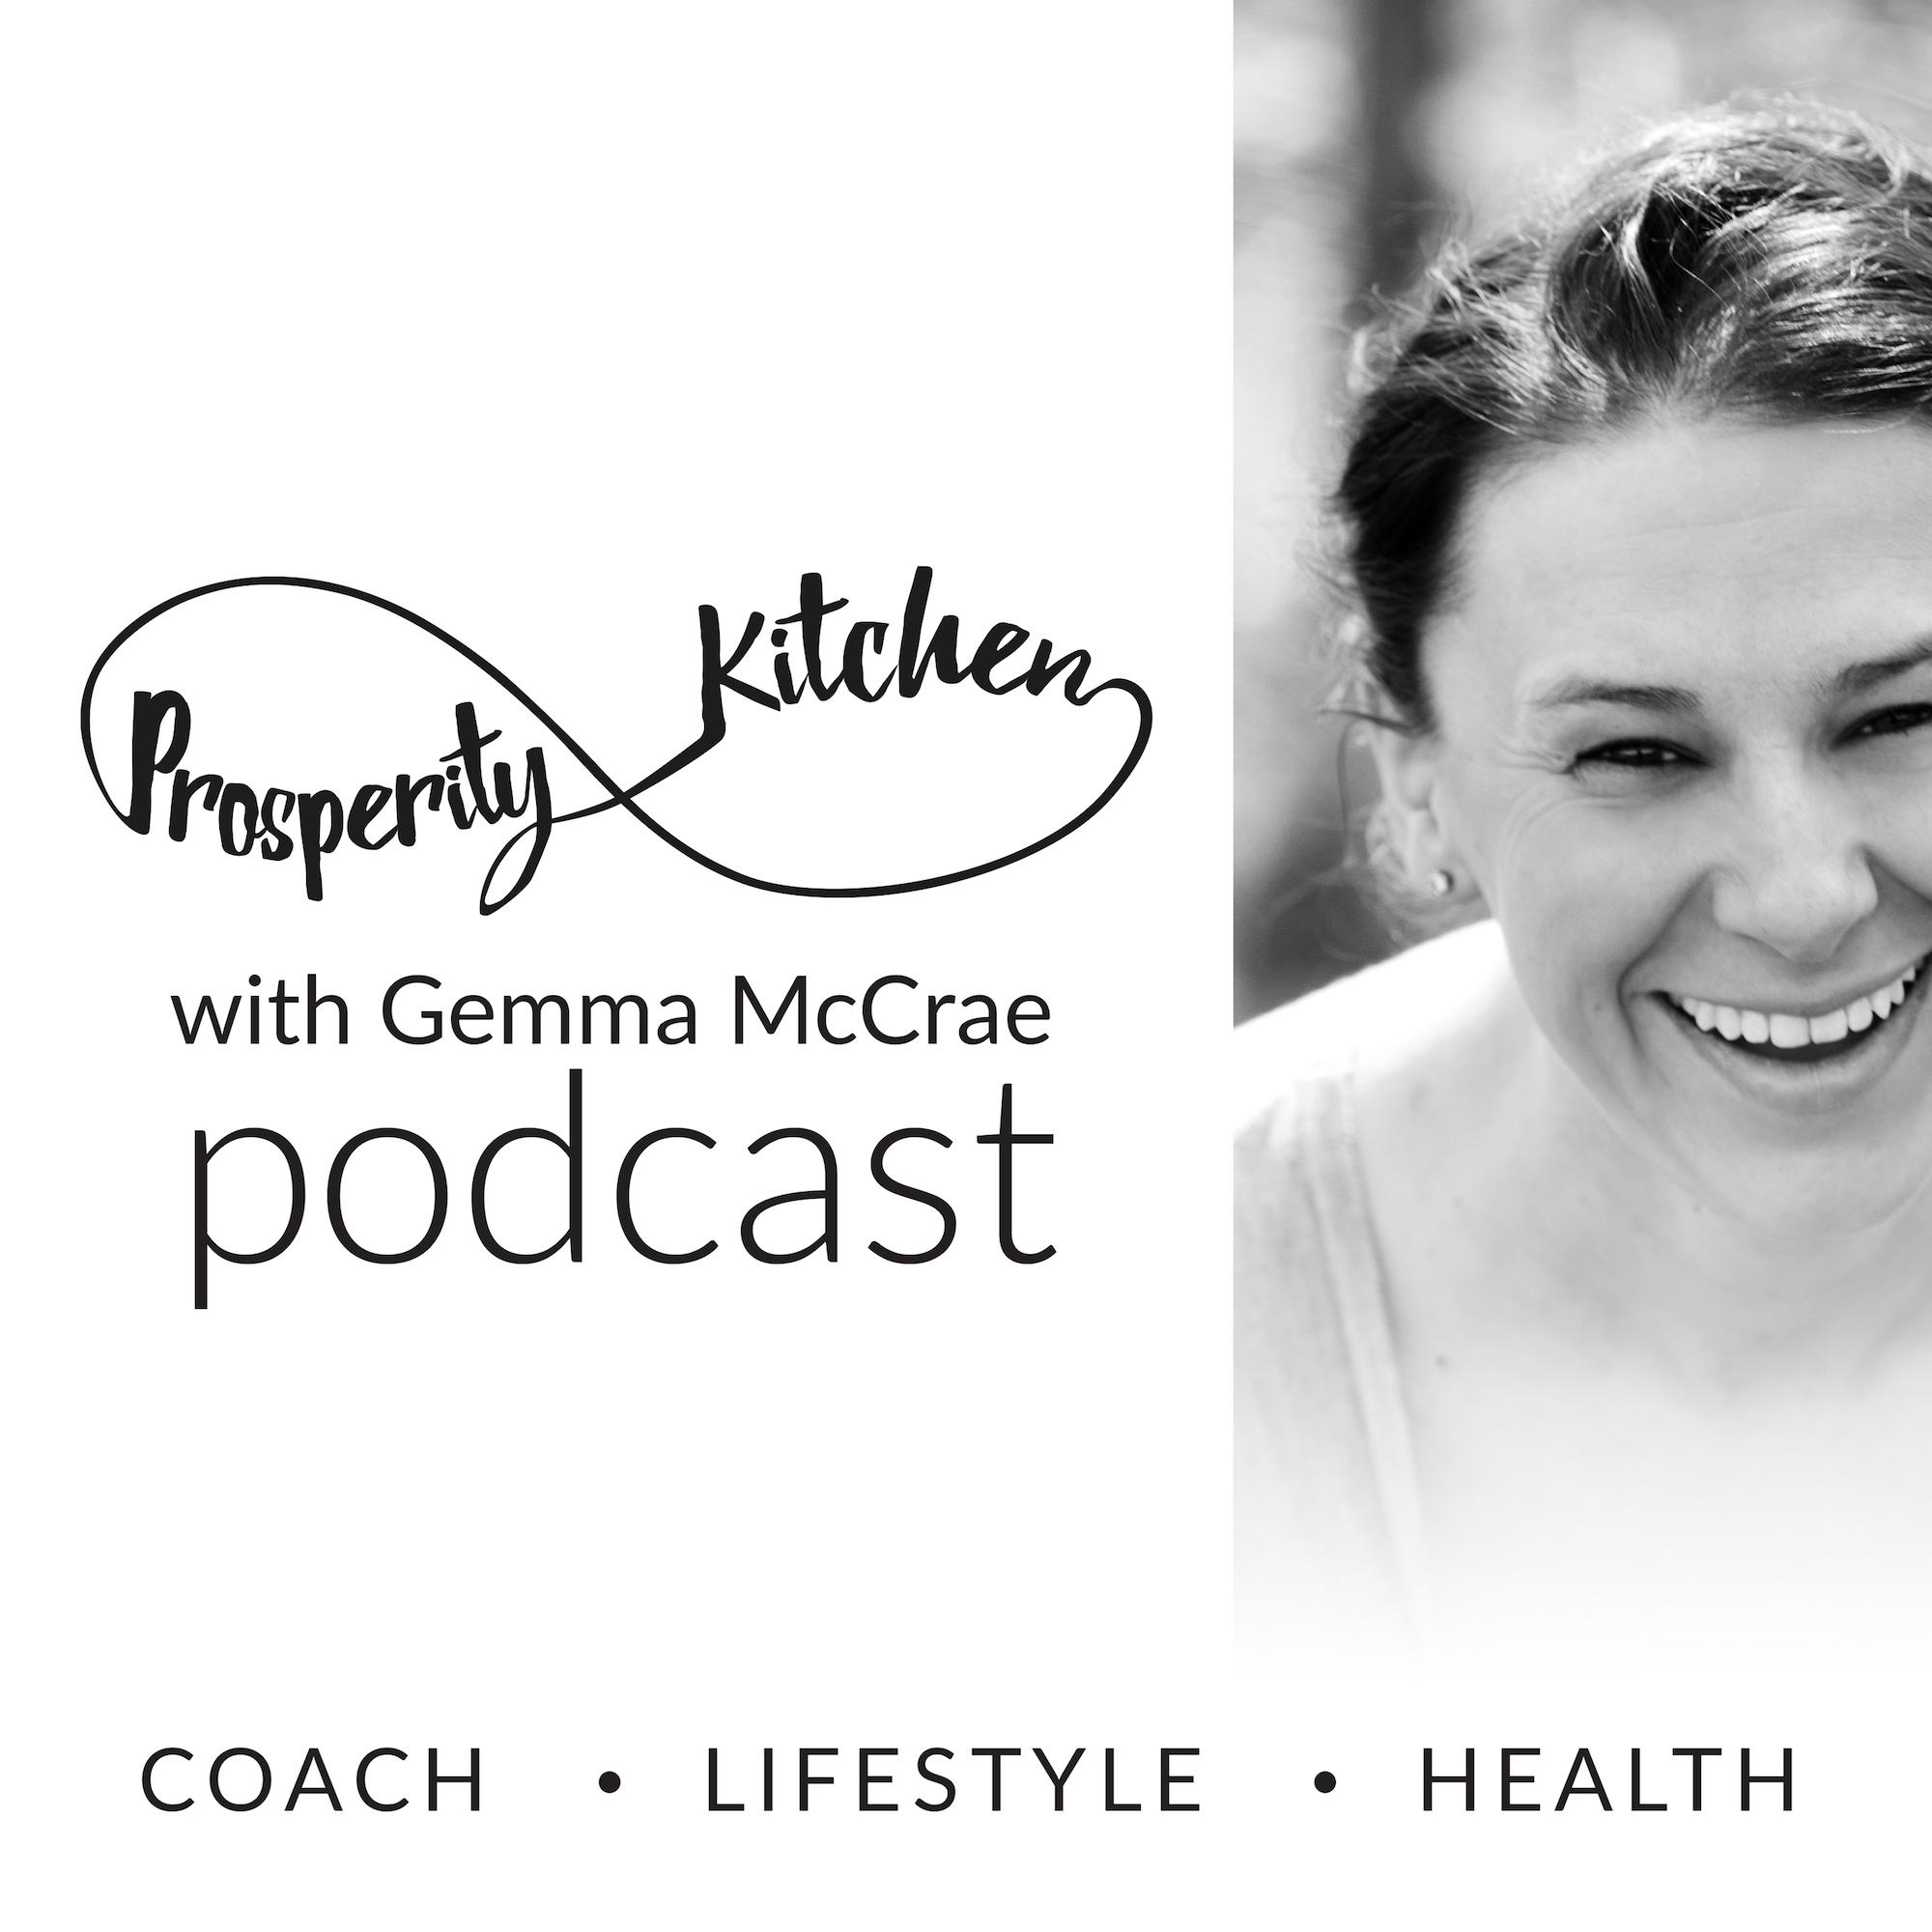 Prosperity Kitchen Podcast with Gemma McCrae show art